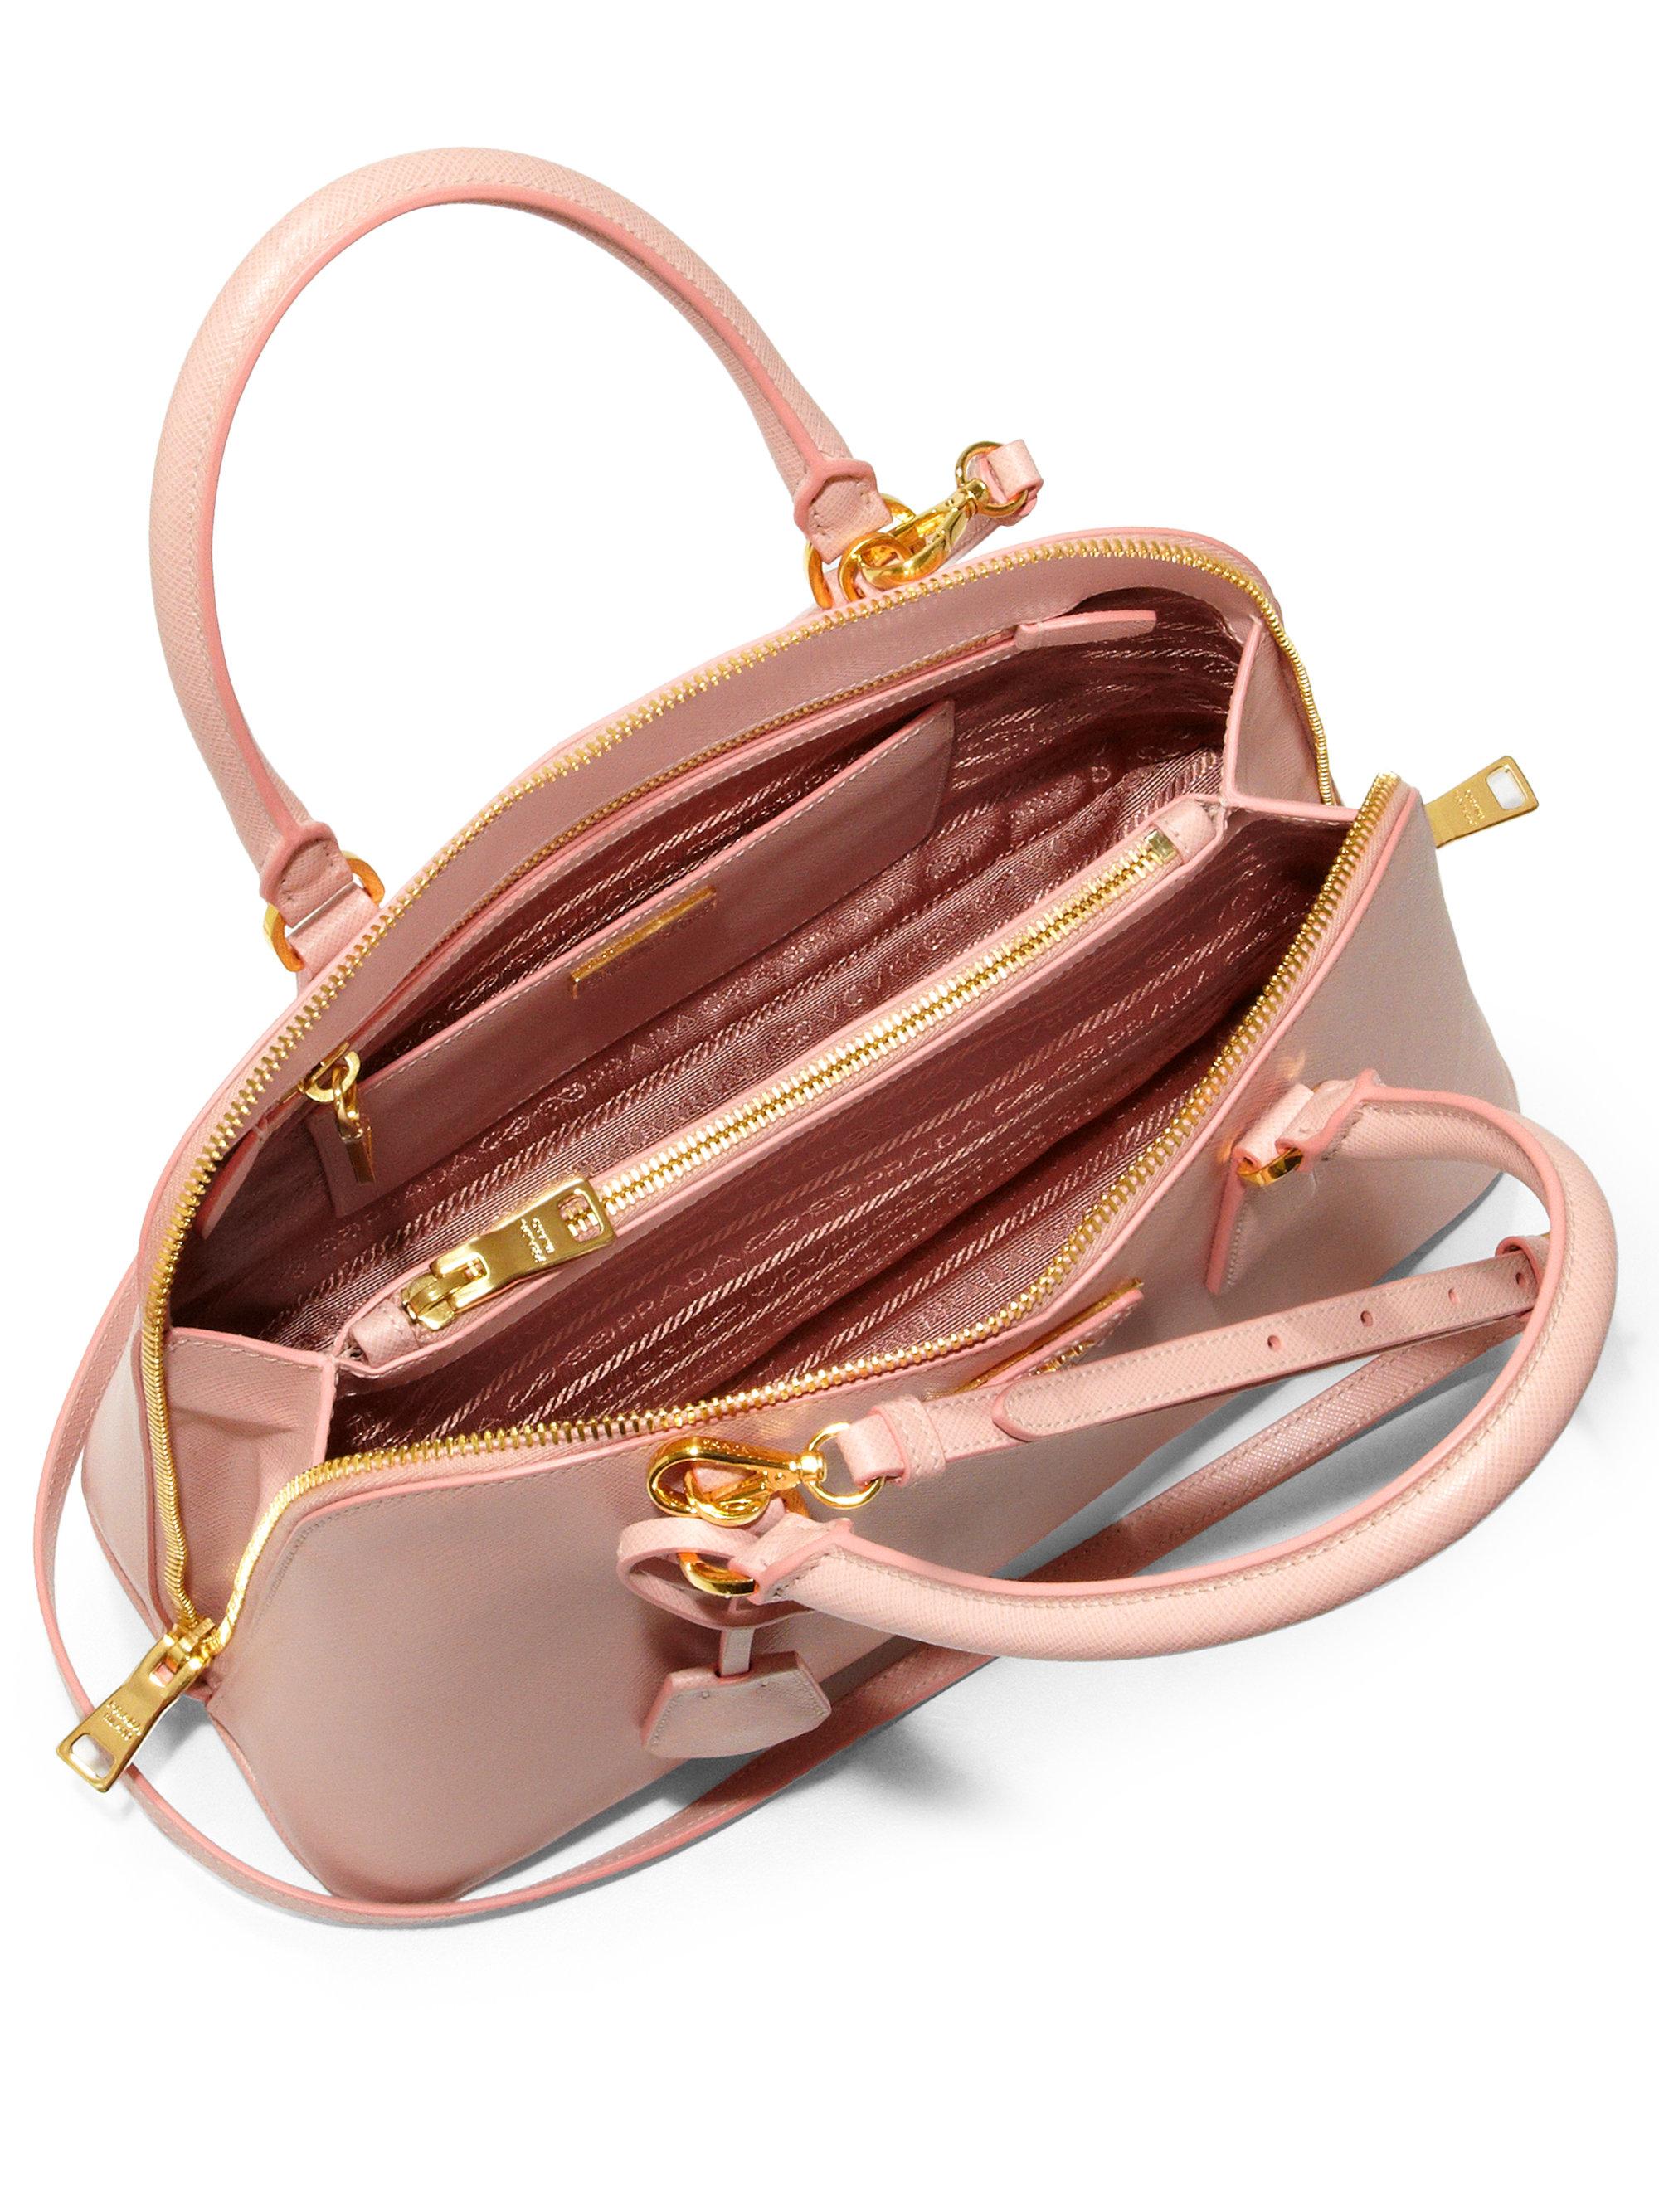 prada gold wallet - Prada Saffiano Lux Small Promenade in Pink (ORCHID) | Lyst